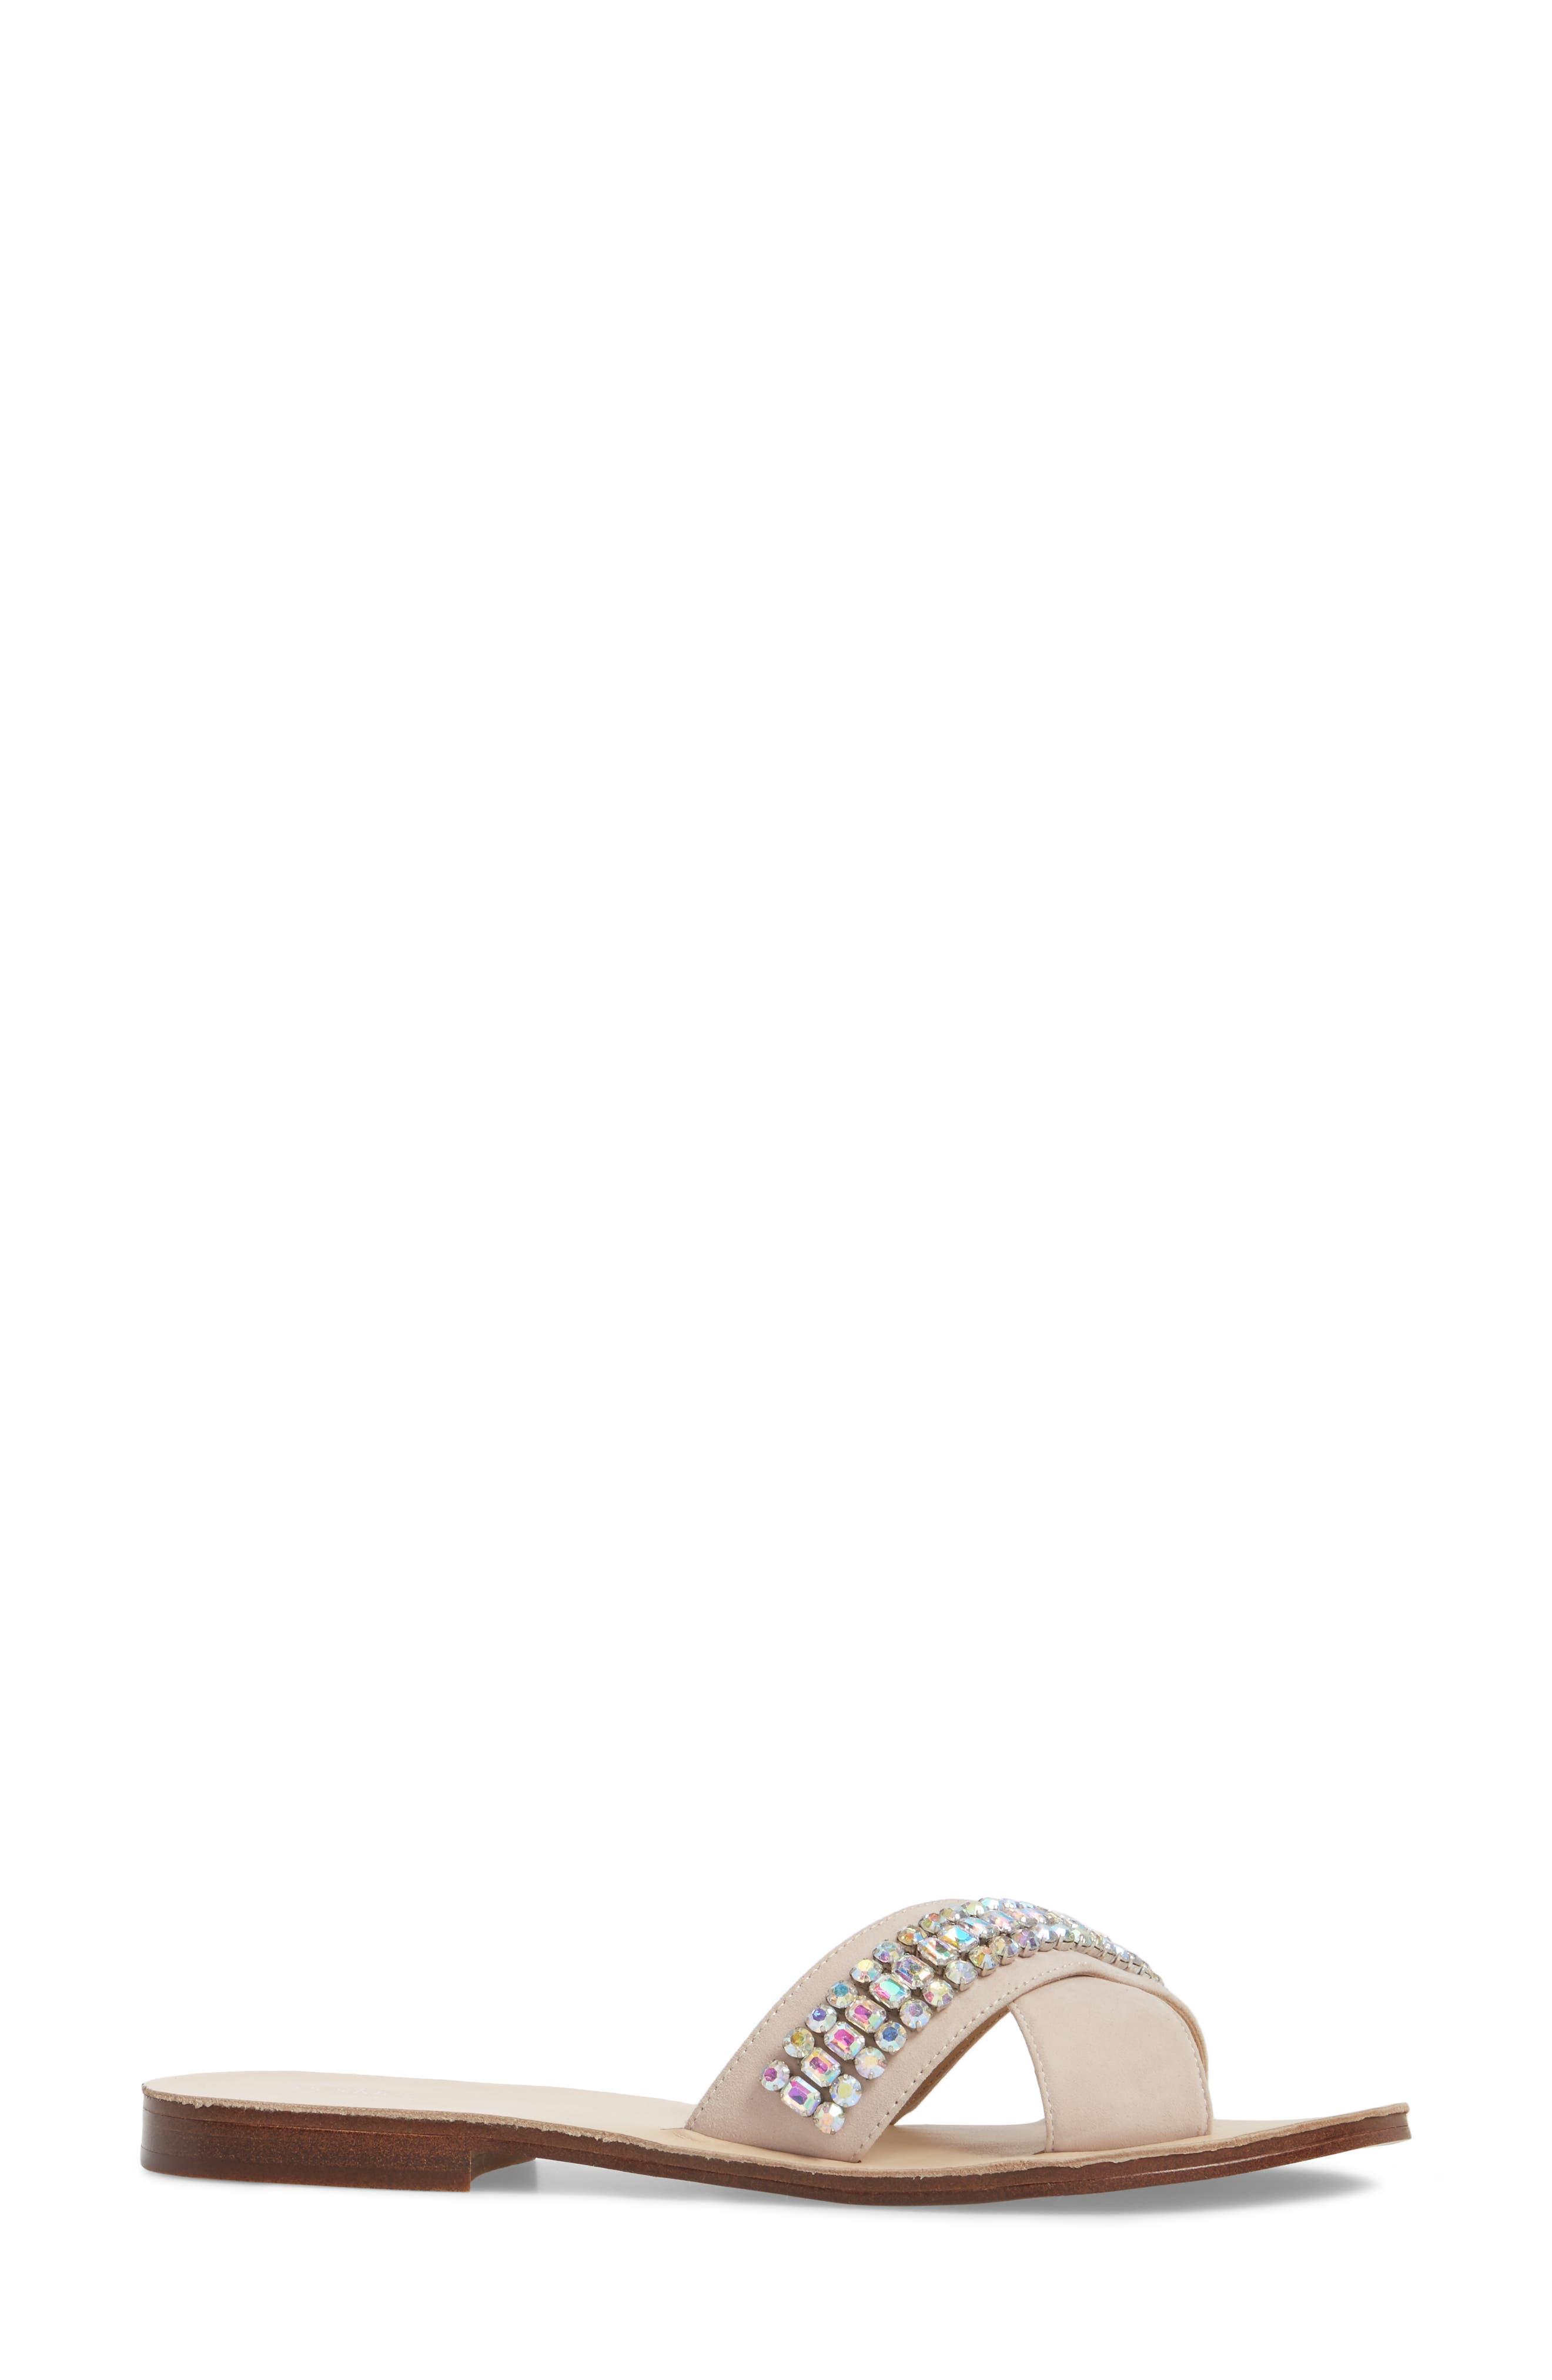 Alana Slide Sandal,                             Alternate thumbnail 3, color,                             Blush Stone Suede